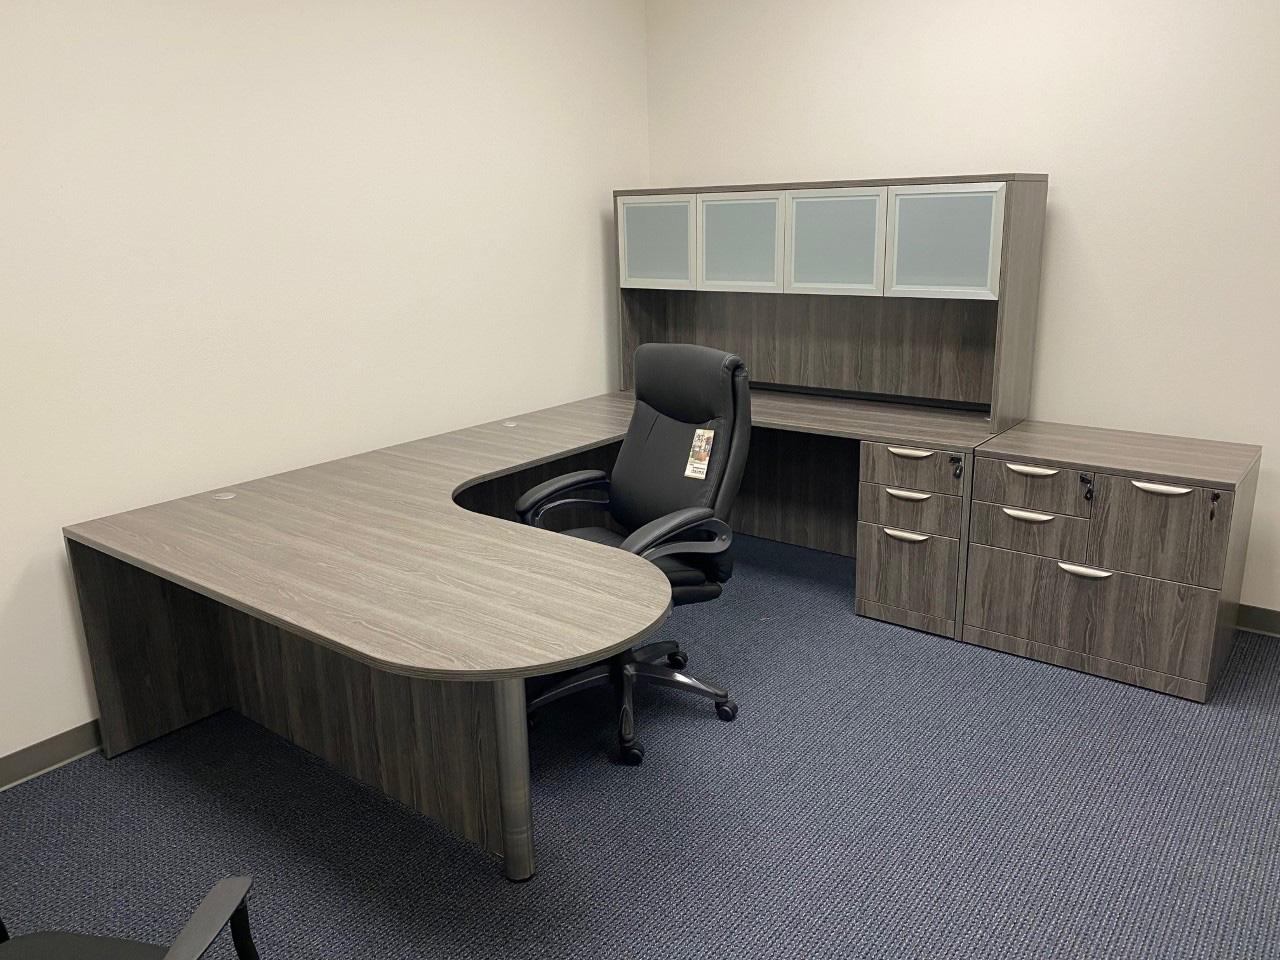 office-cubicle-furniture-suppliers-in-bradenton-florida-10-.jpg